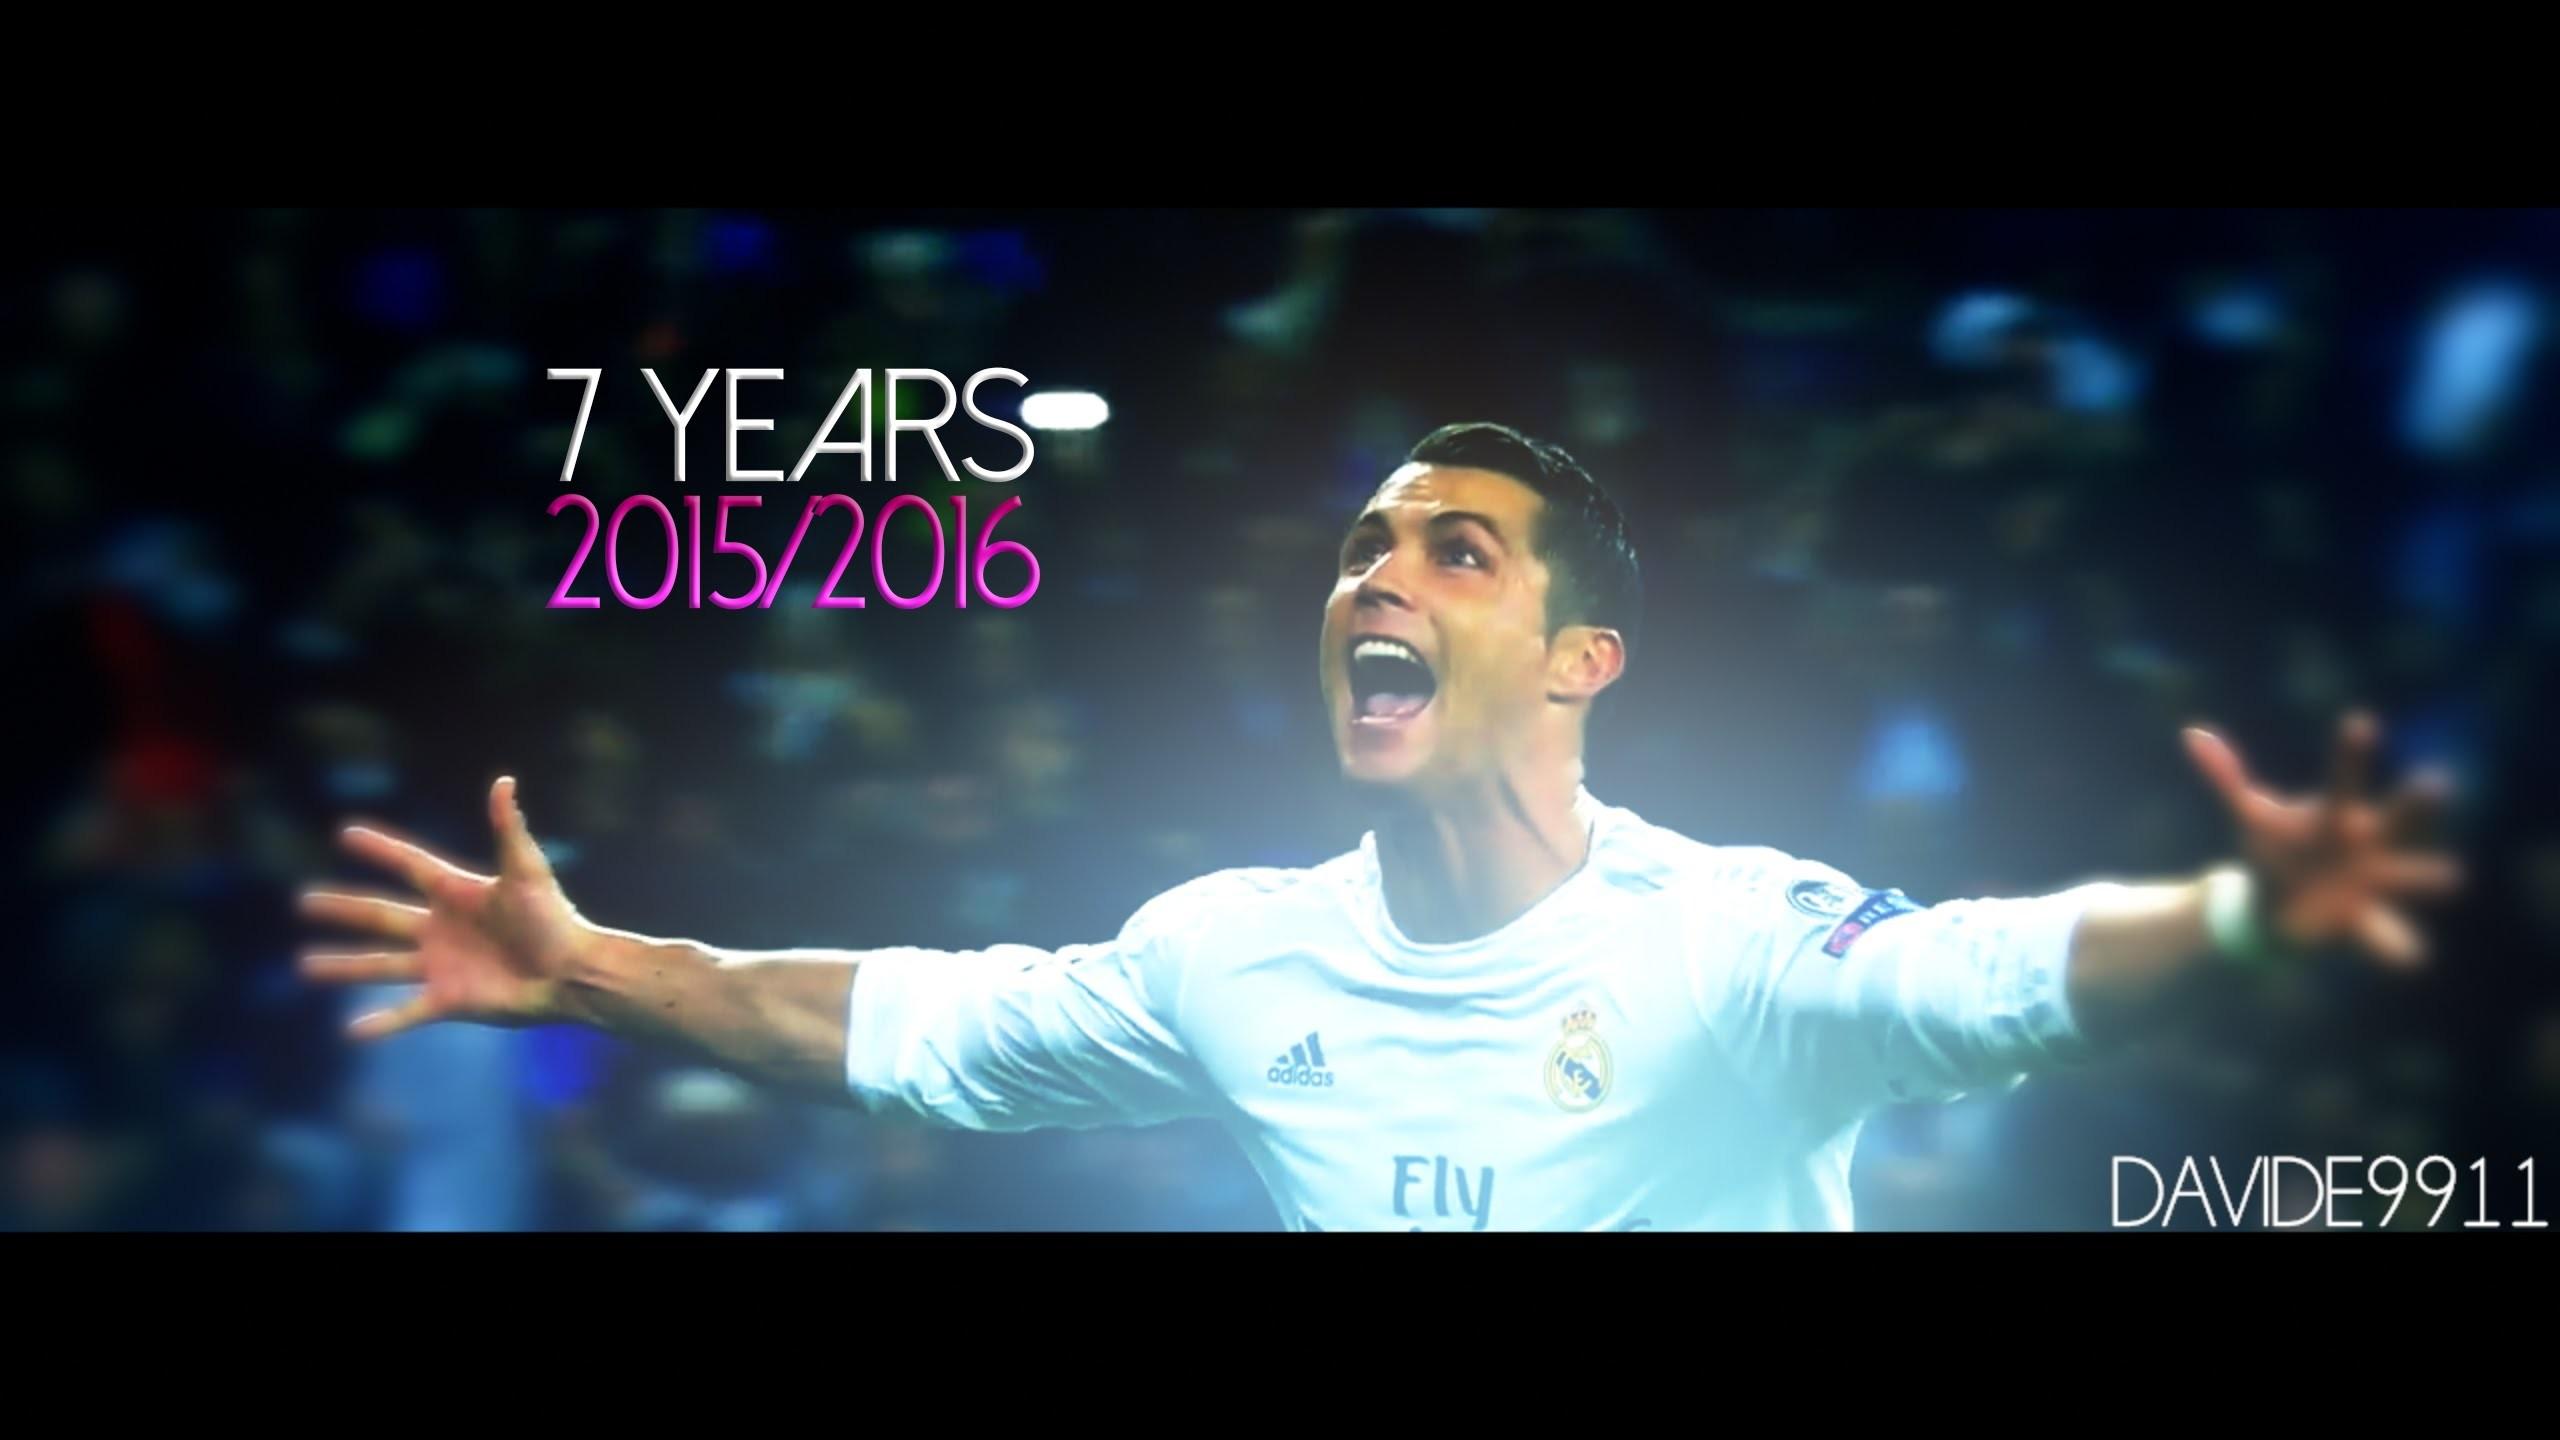 Real Girl Full Hd Wallpaper Cristiano Ronaldo 7 Wallpaper 2018 69 Images